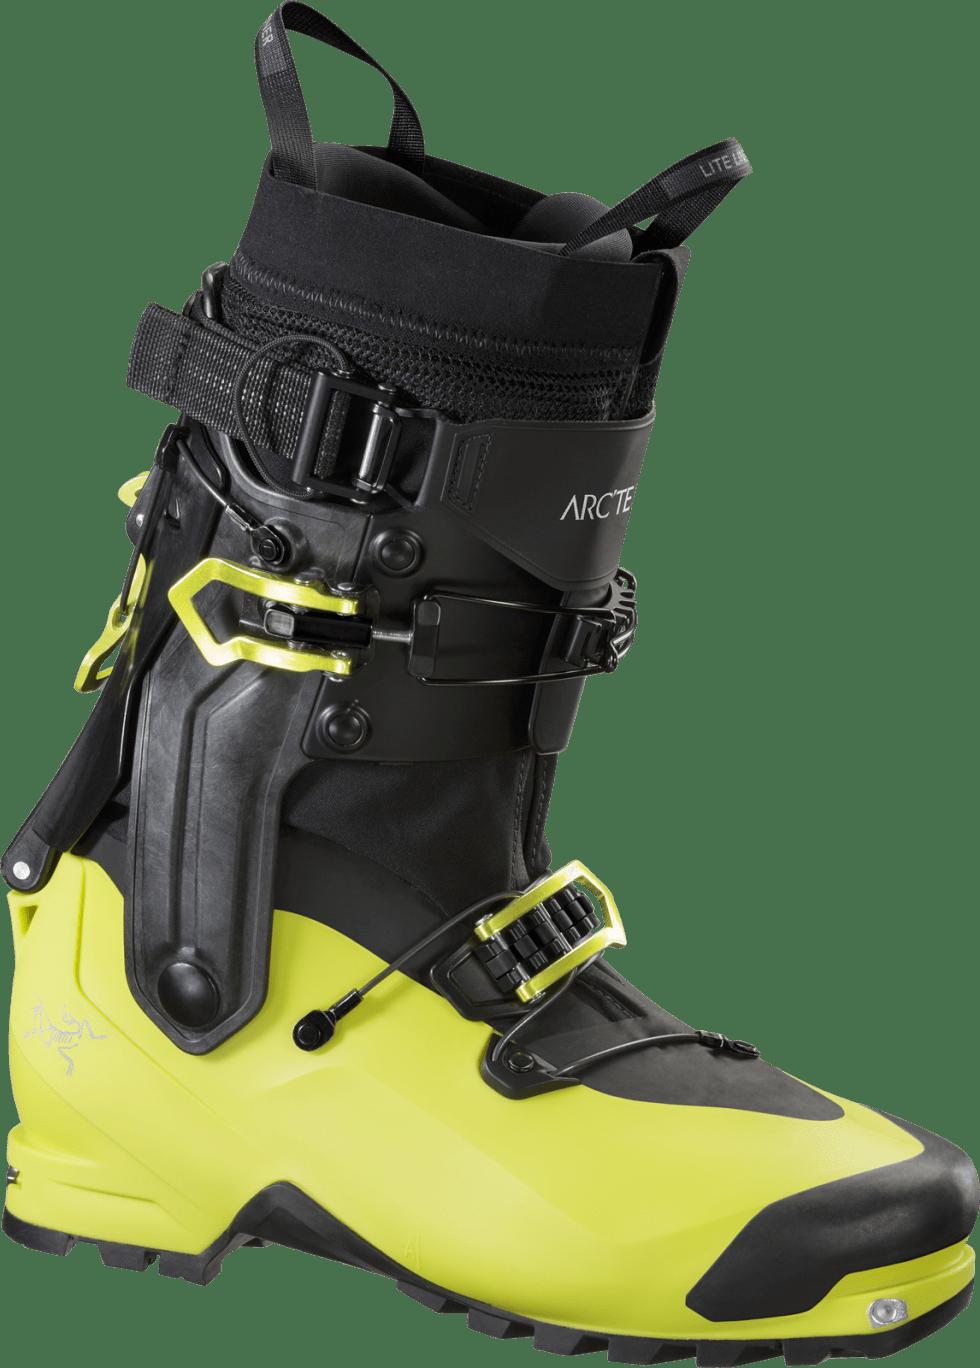 ARC_F16-Procline-Lite-Boot-W-Euphoria